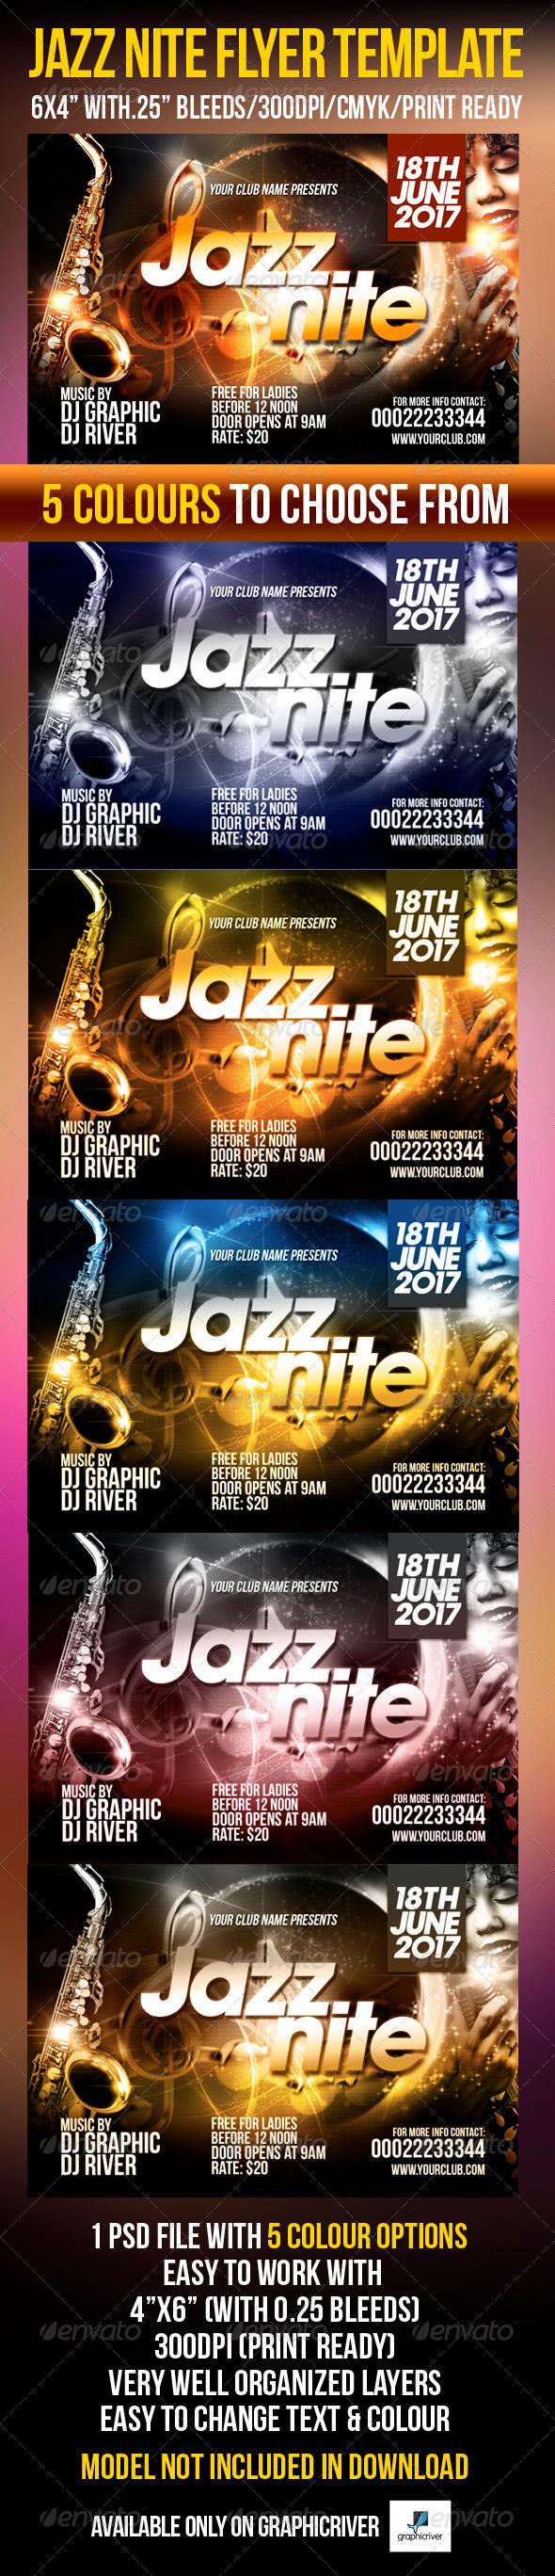 Jazz Nite Flyer Template  - Flyers Print Templates